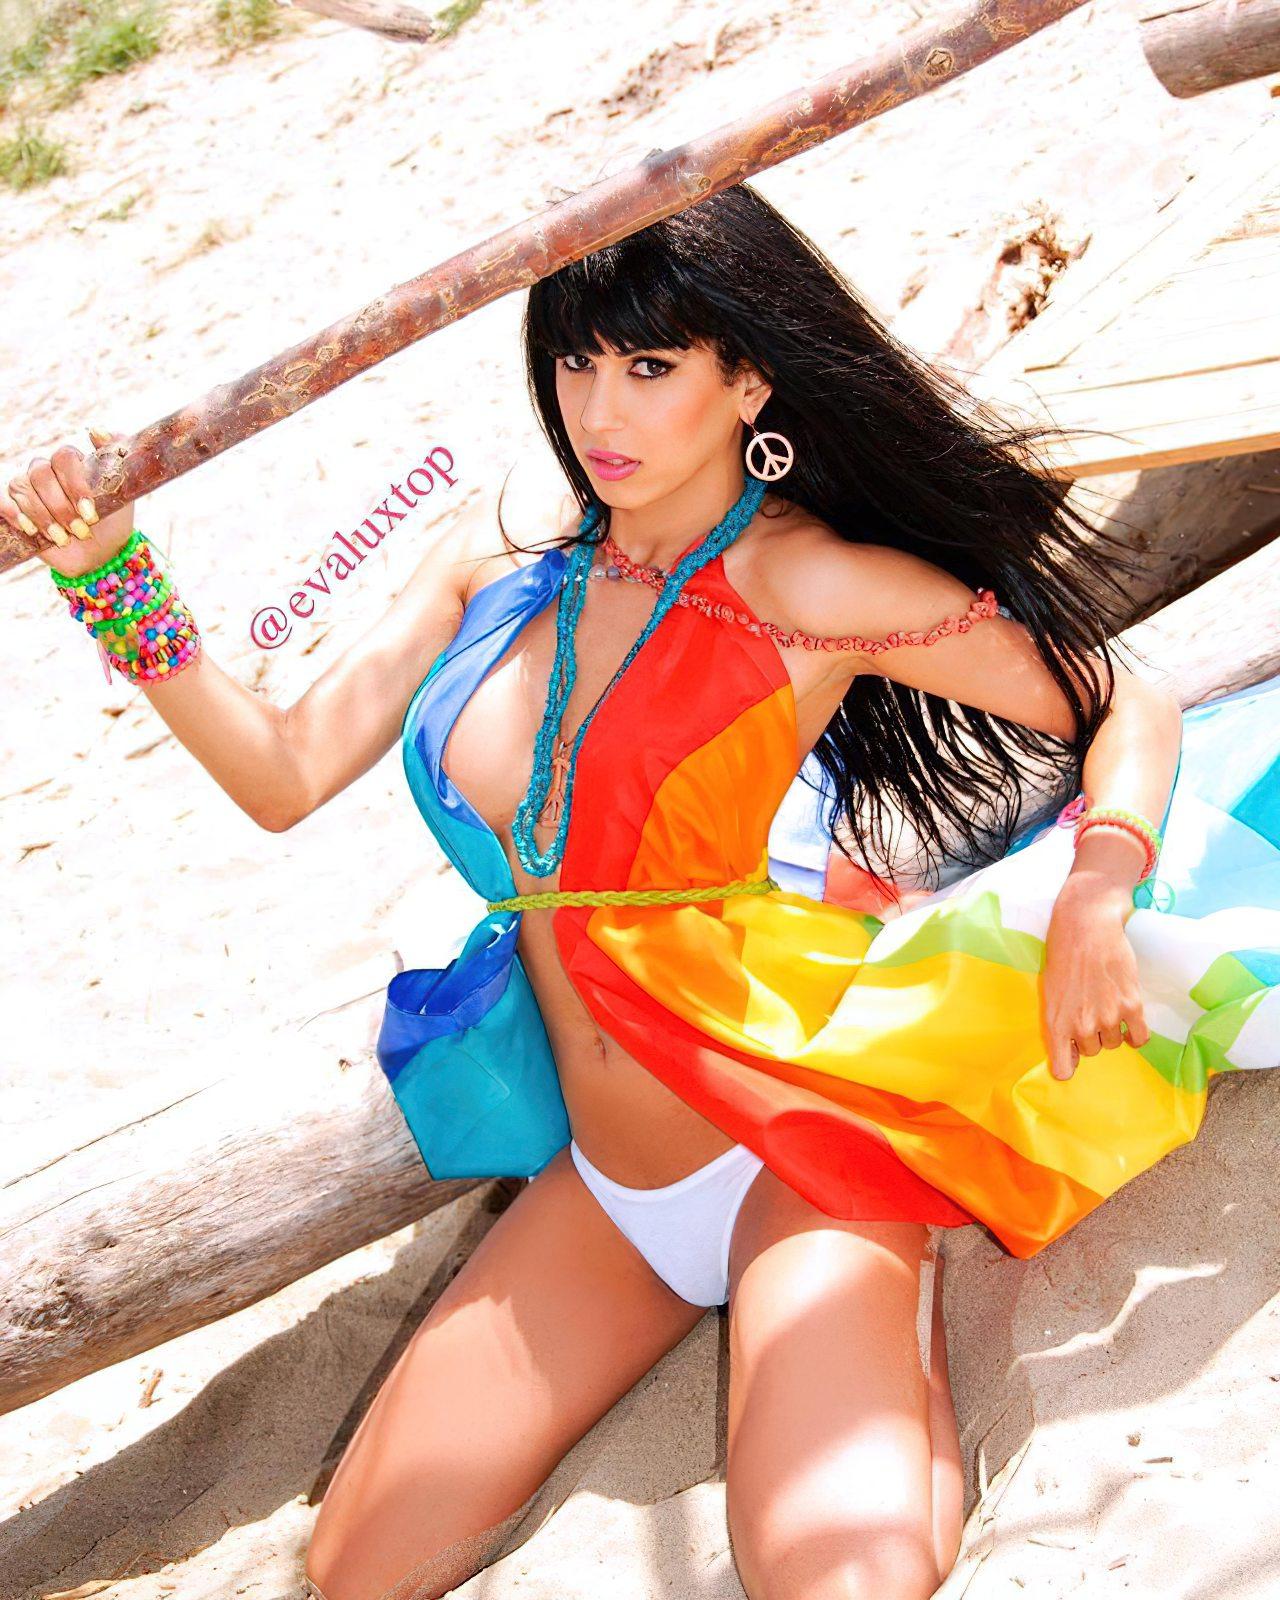 Travestis Imagens (36)